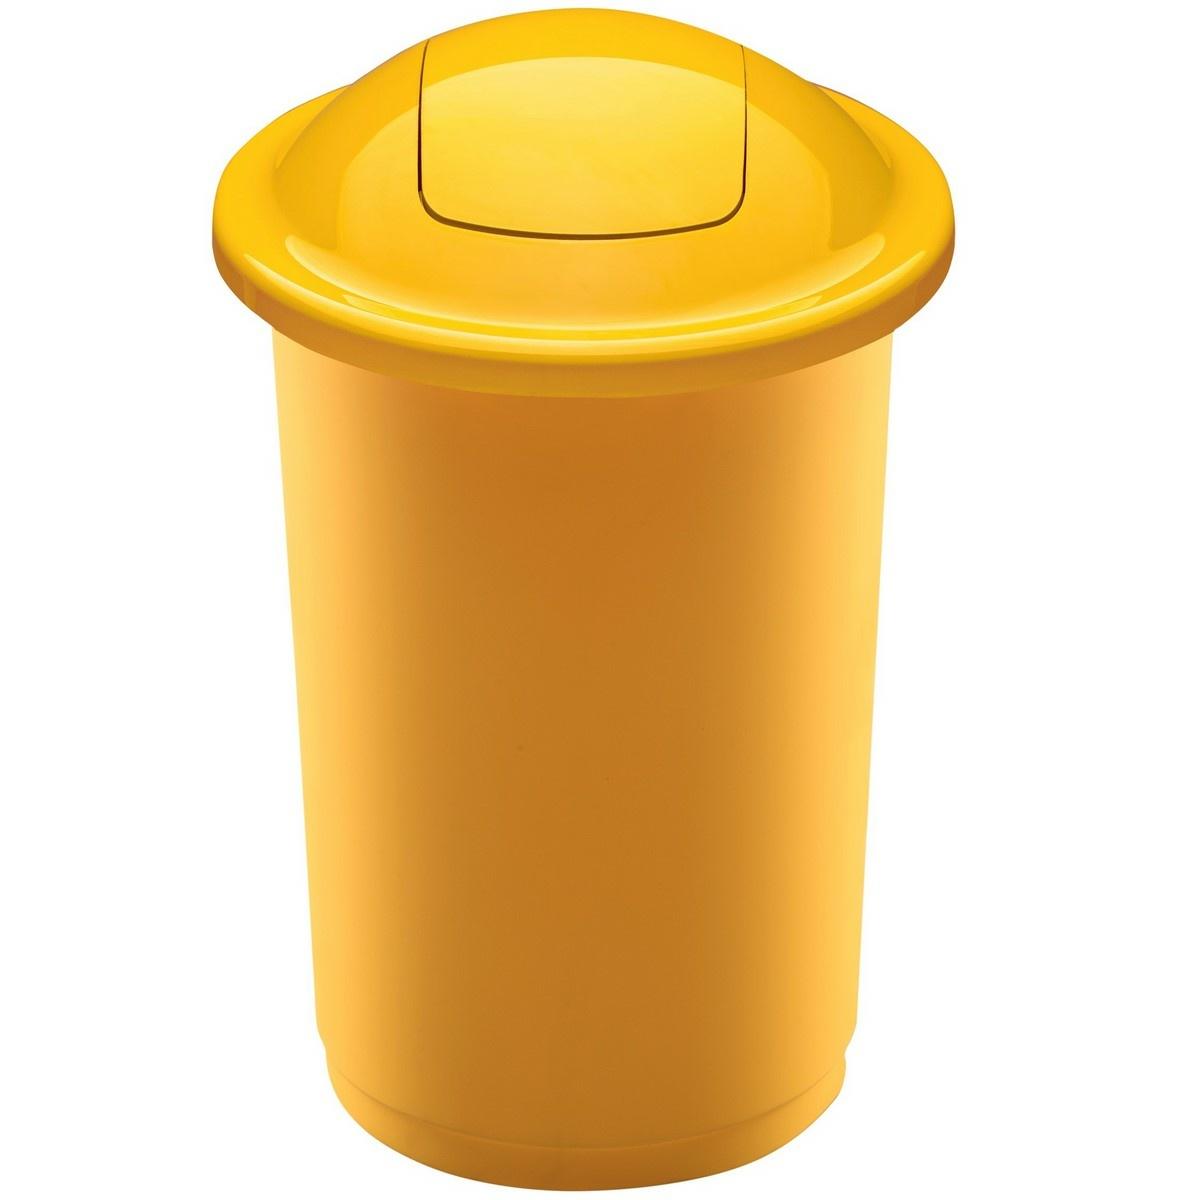 Coș de sortare deșeuri Aldo Top Bin, 50 l, galben imagine 2021 e4home.ro